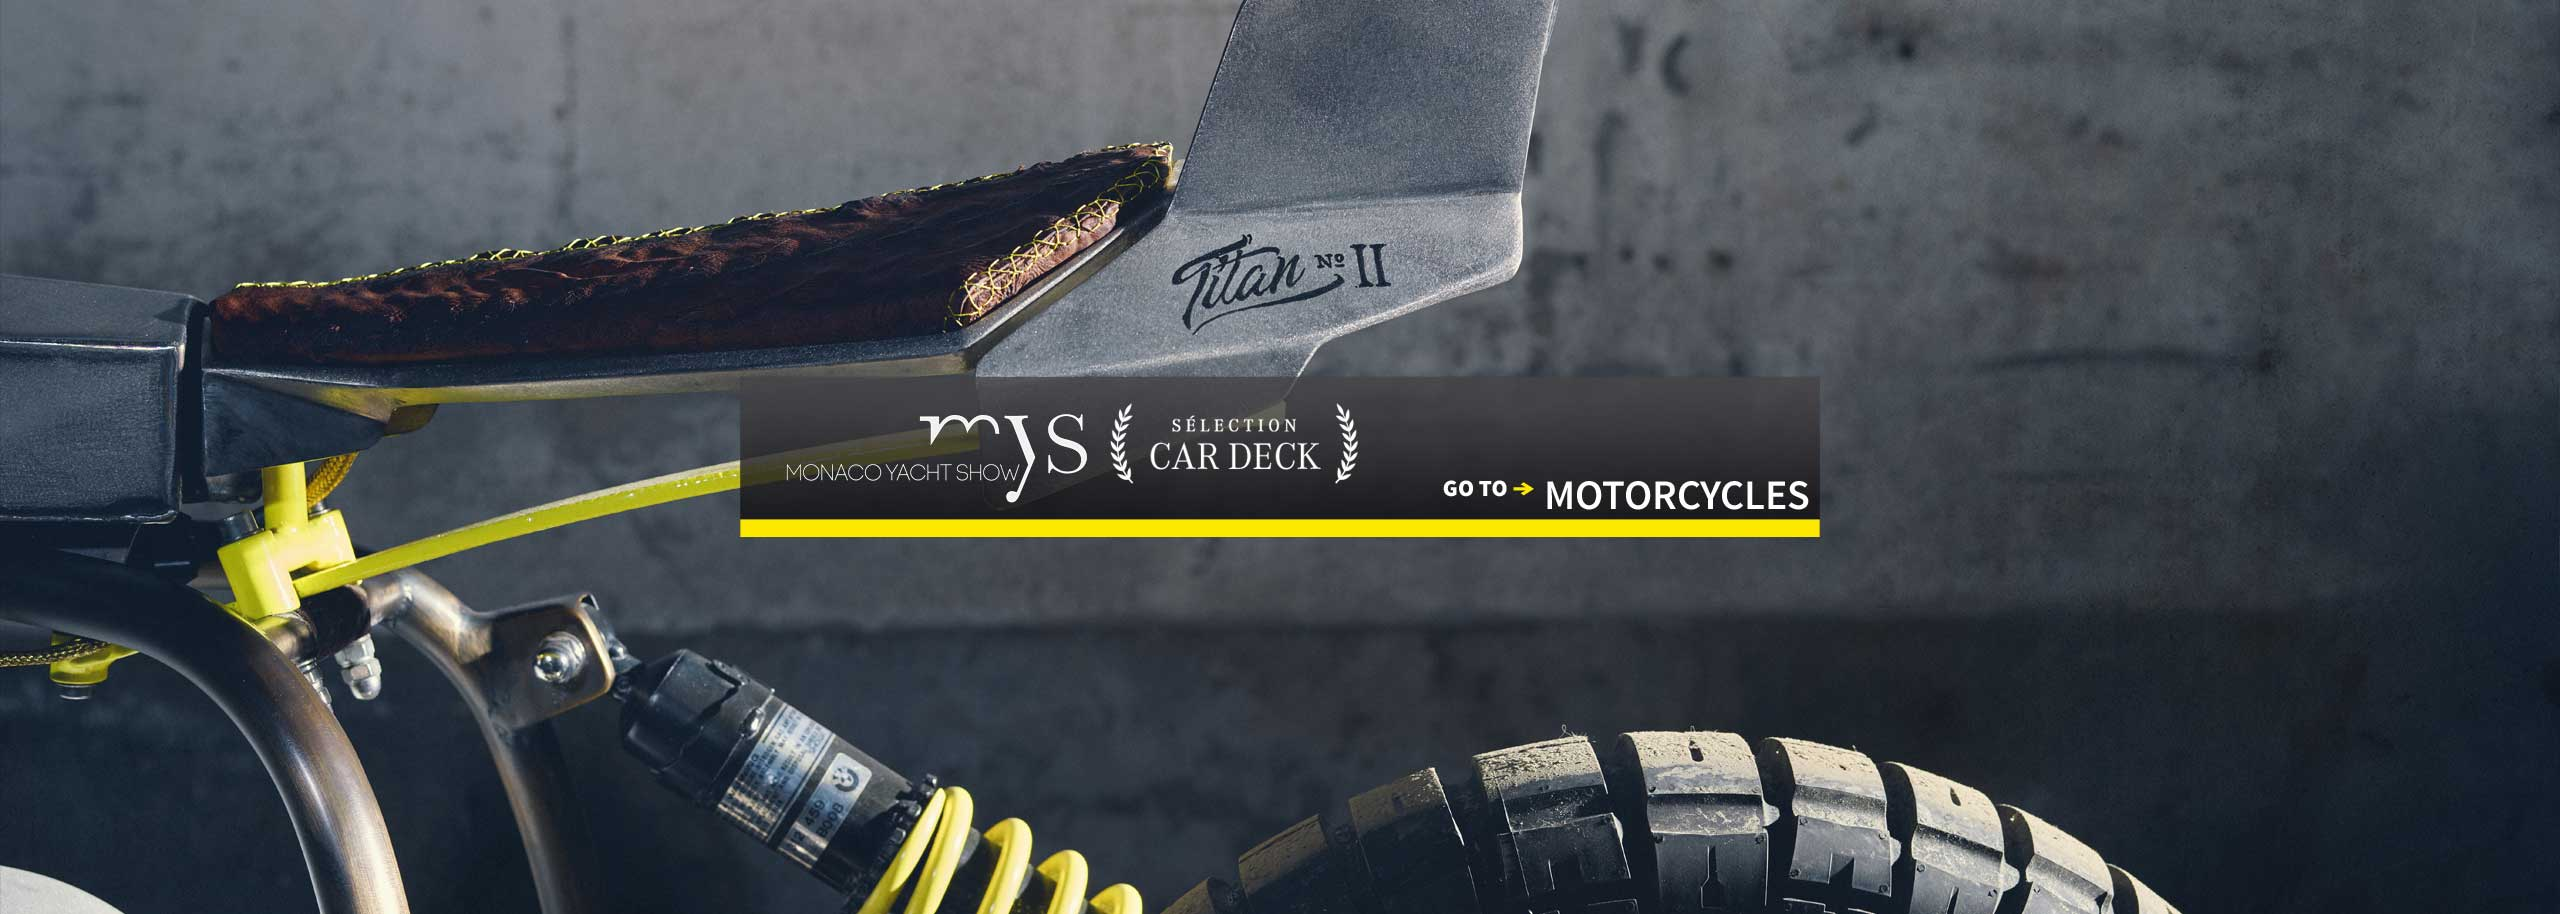 TITAN-No-2-Cafe-Racer-Graz-BMW-Motorrad-Concept-Studie-Custom-Bike-Österreich-Styria-Konzepte-Design-Monaco-Yacht-Show-Car-Deck-Racing